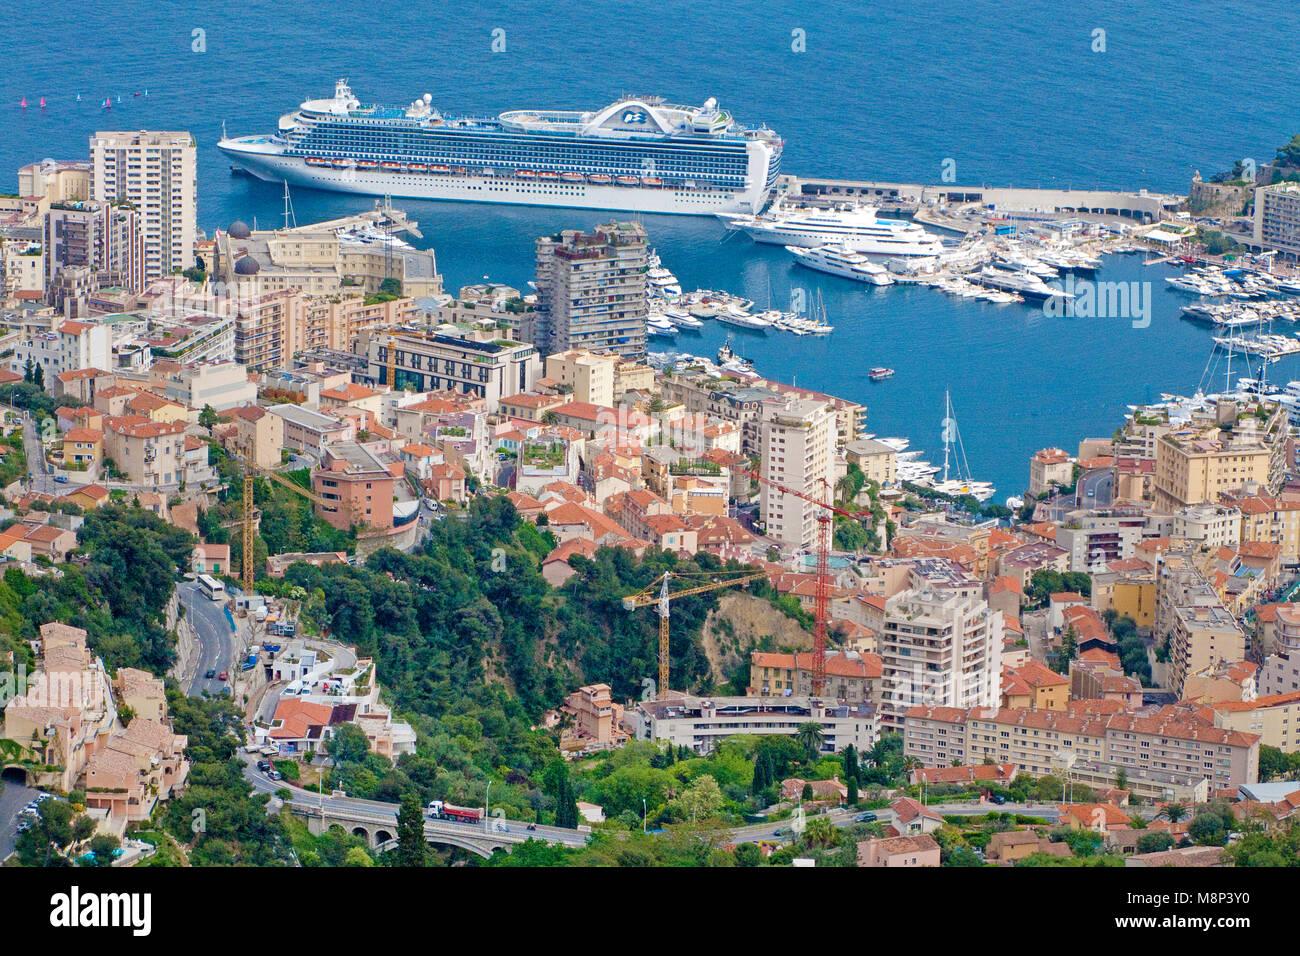 Kreuzfahrtschiff im Hafen von Monaco, Fuerstentum Monaco, Europa   Cruise liner at harbour of Monaco, Principality - Stock Image